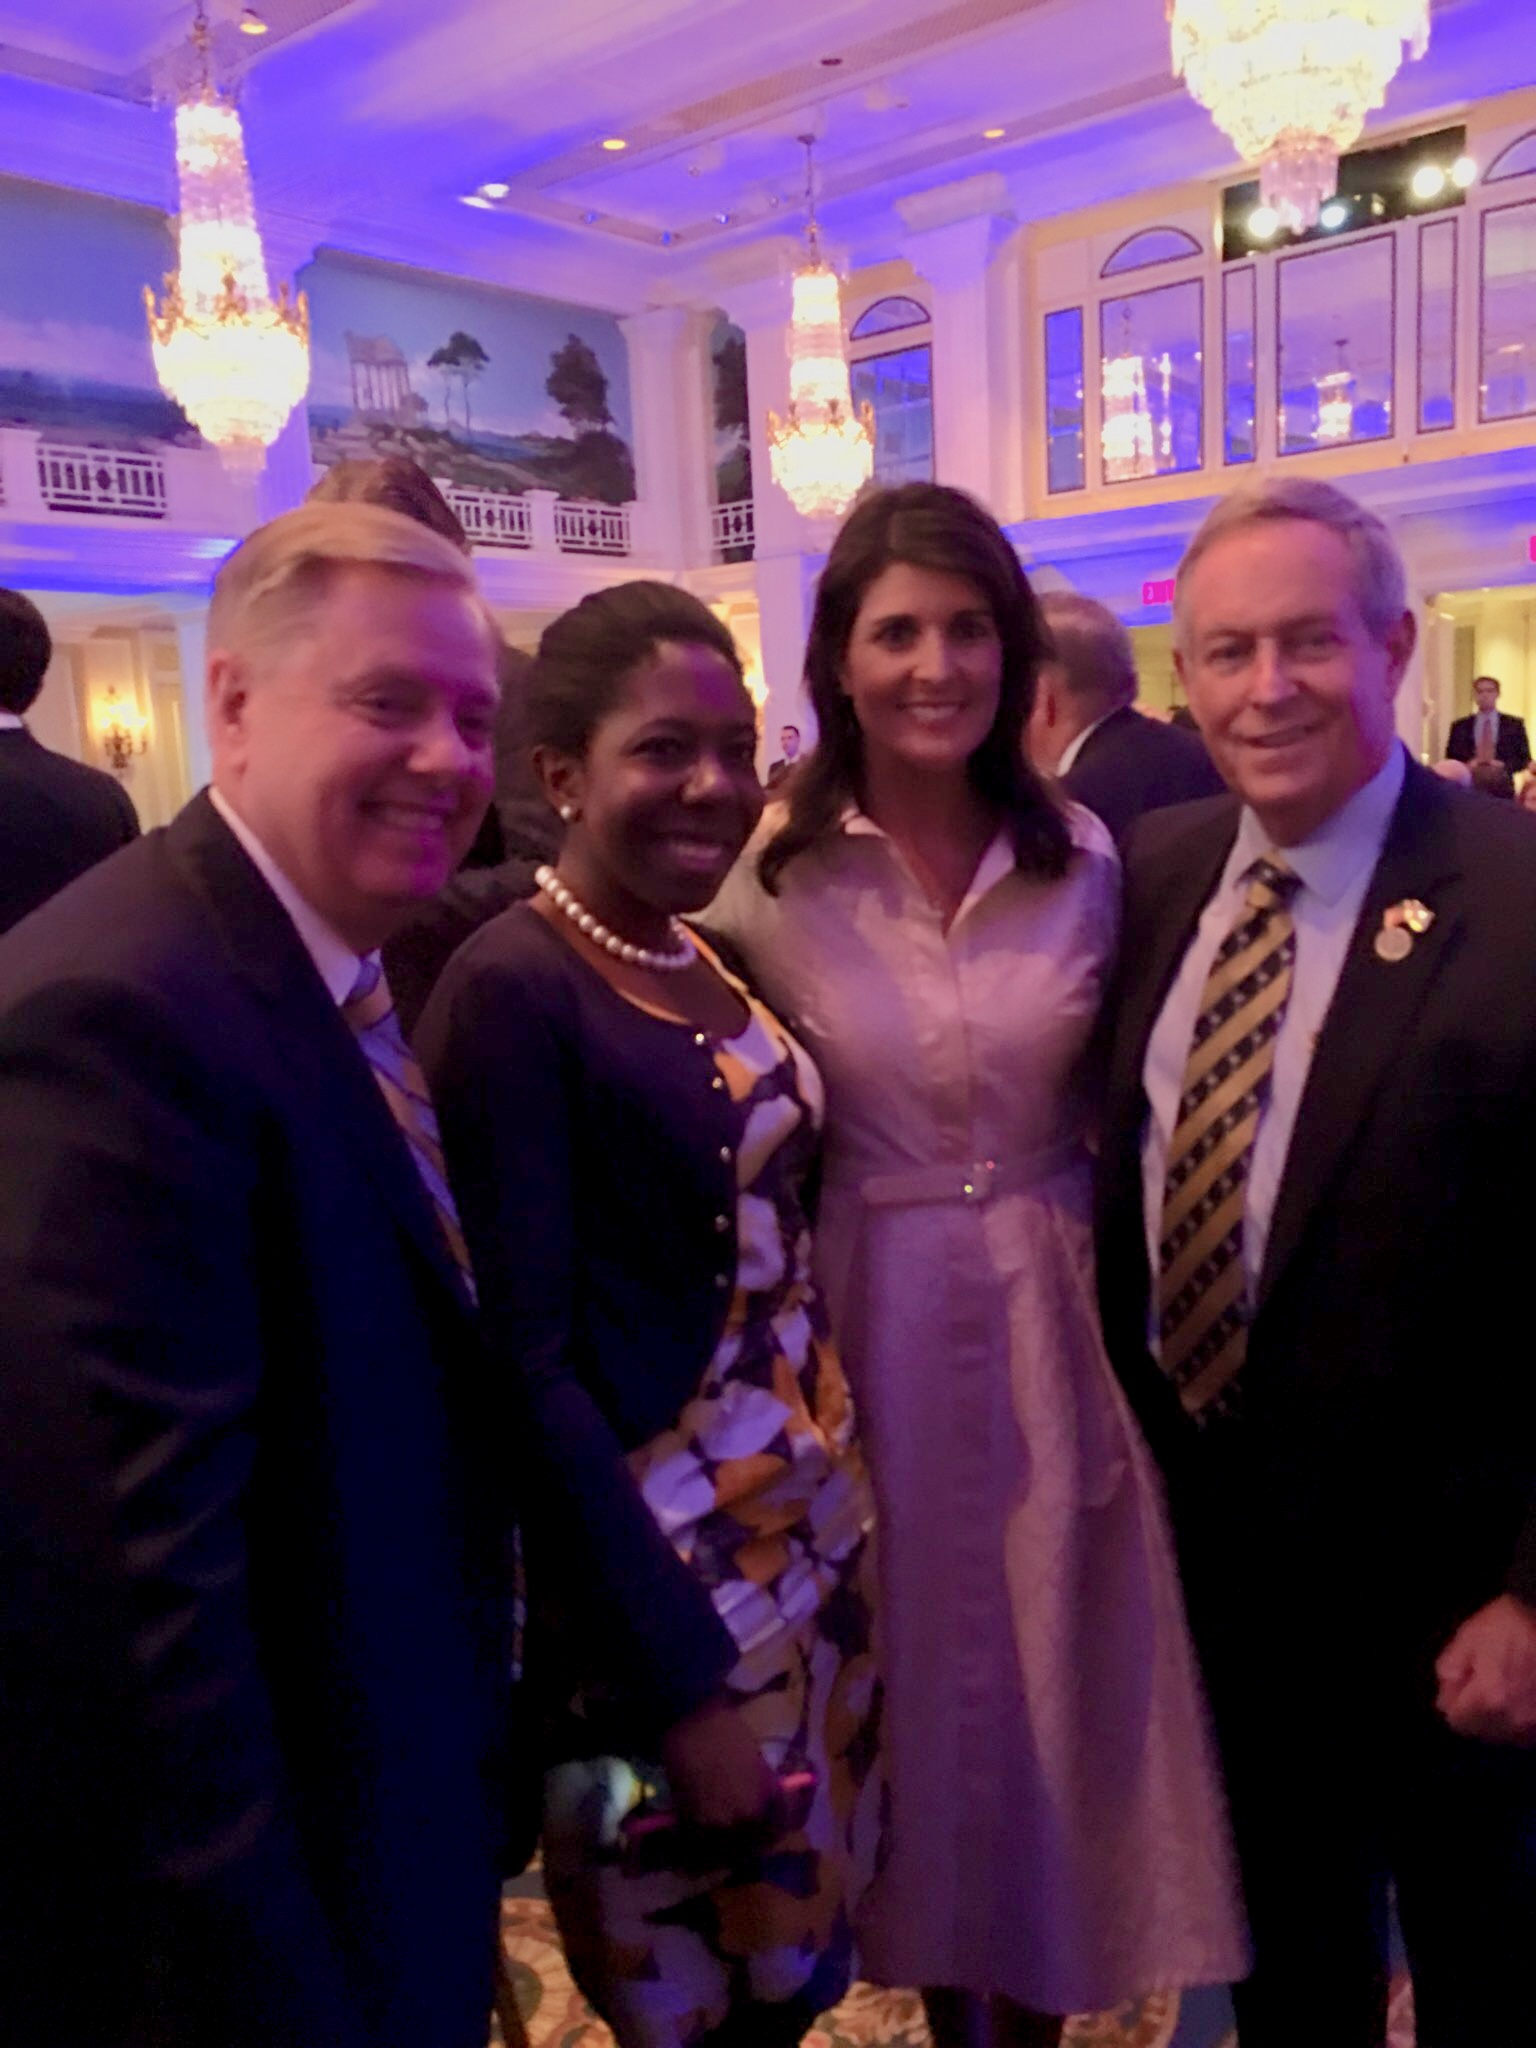 With U.S. Senator Lindsey Graham, Former US Ambassador to the United Nations Nikki Haley, & U.S. Congressman Joe Wilson